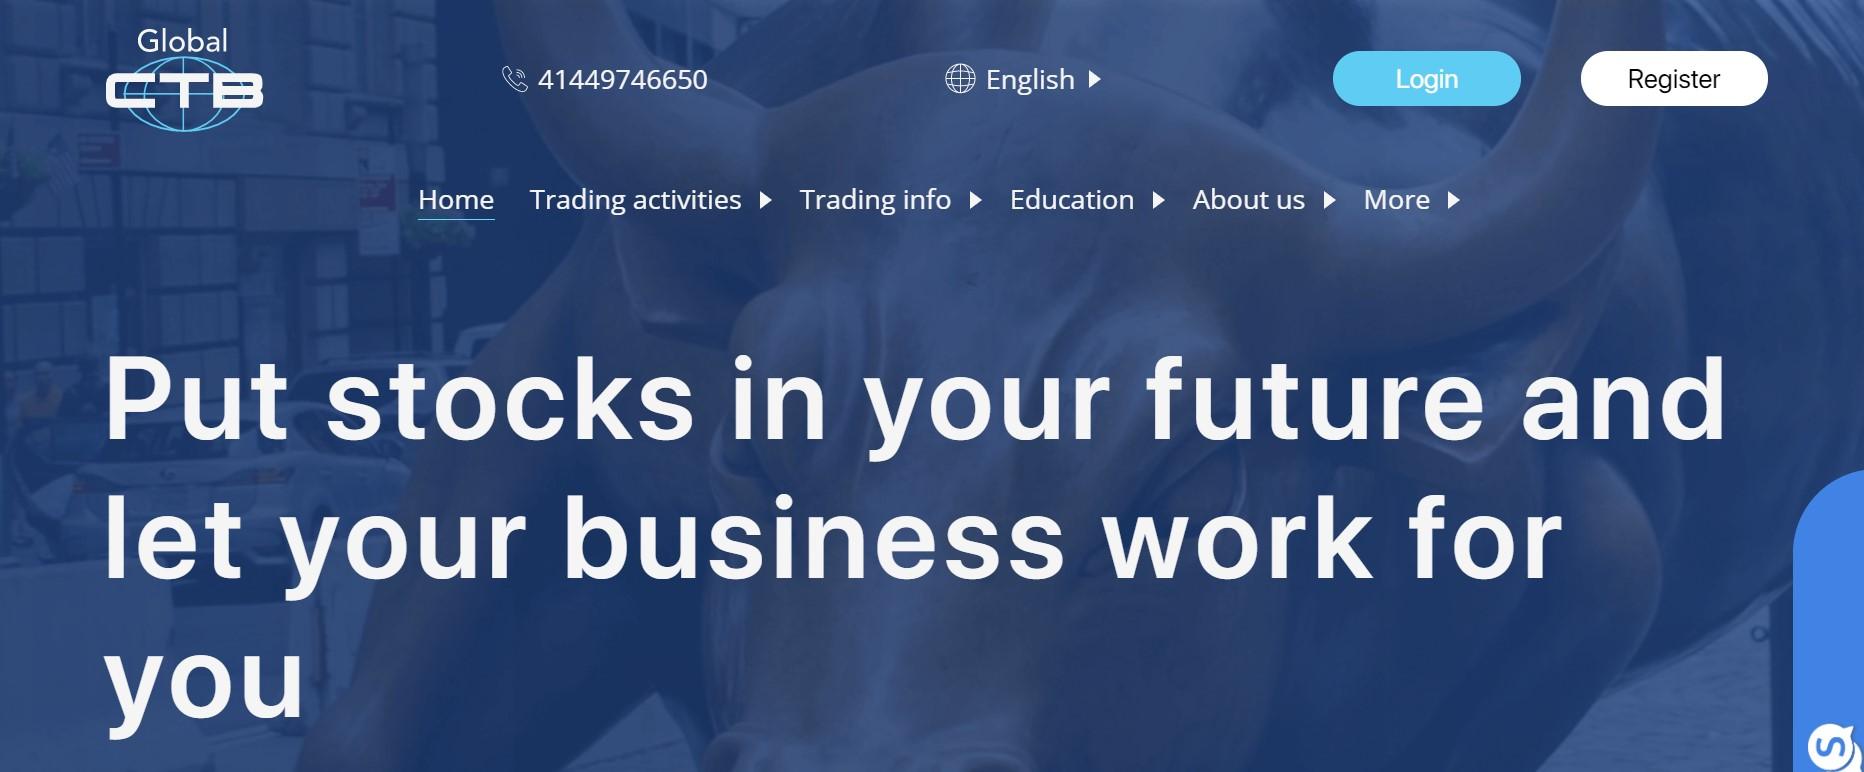 Global CTB website